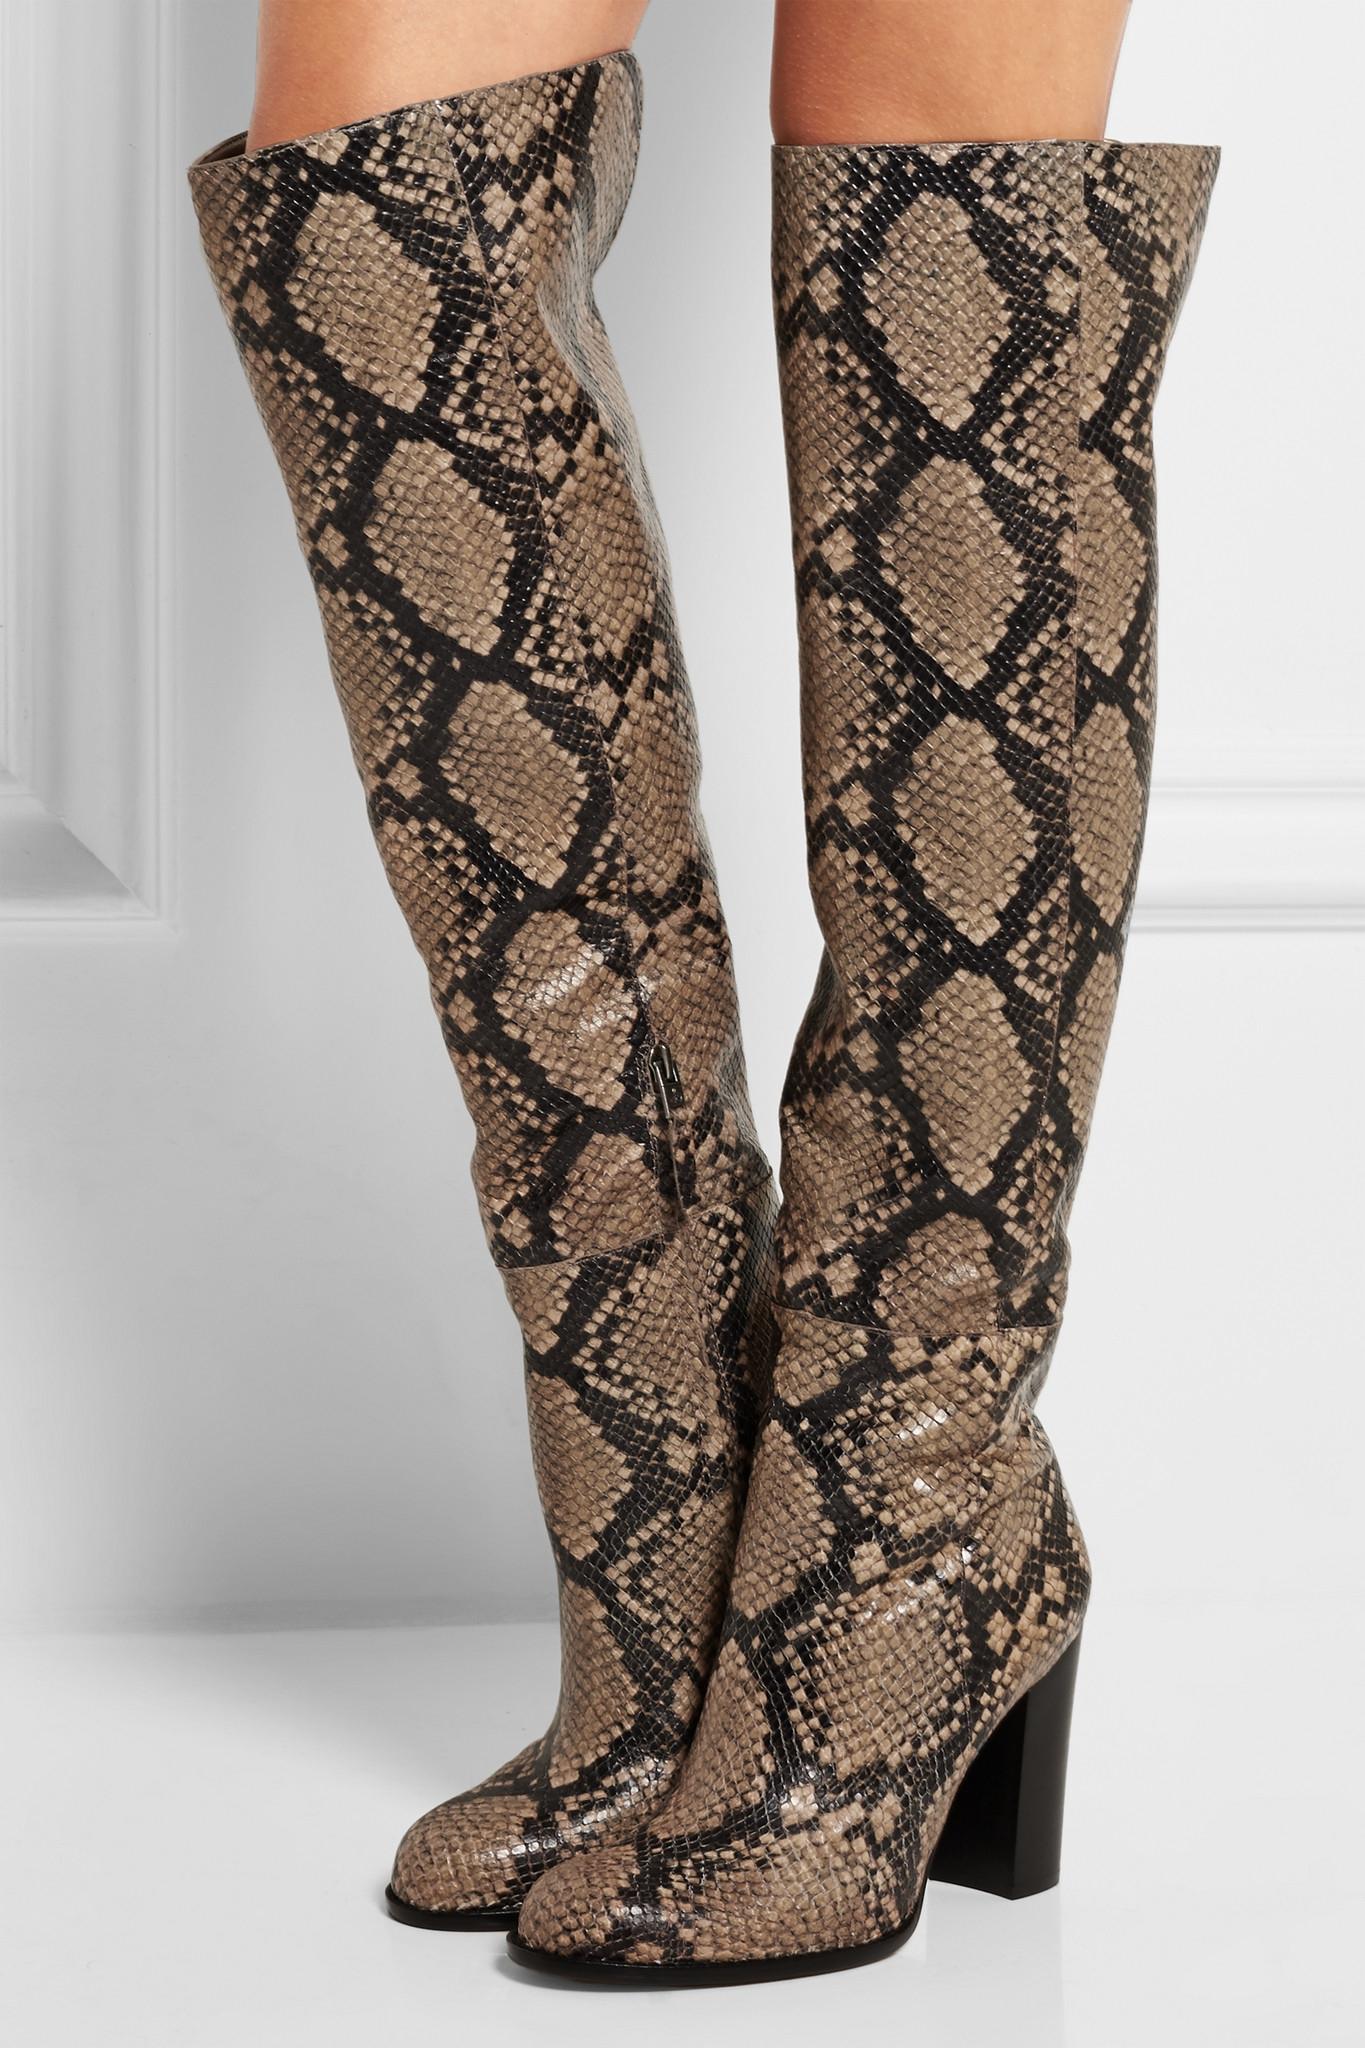 36de2e9f6616 Sam Edelman Rylan Snake-effect Leather Over-the-knee Boots - Lyst